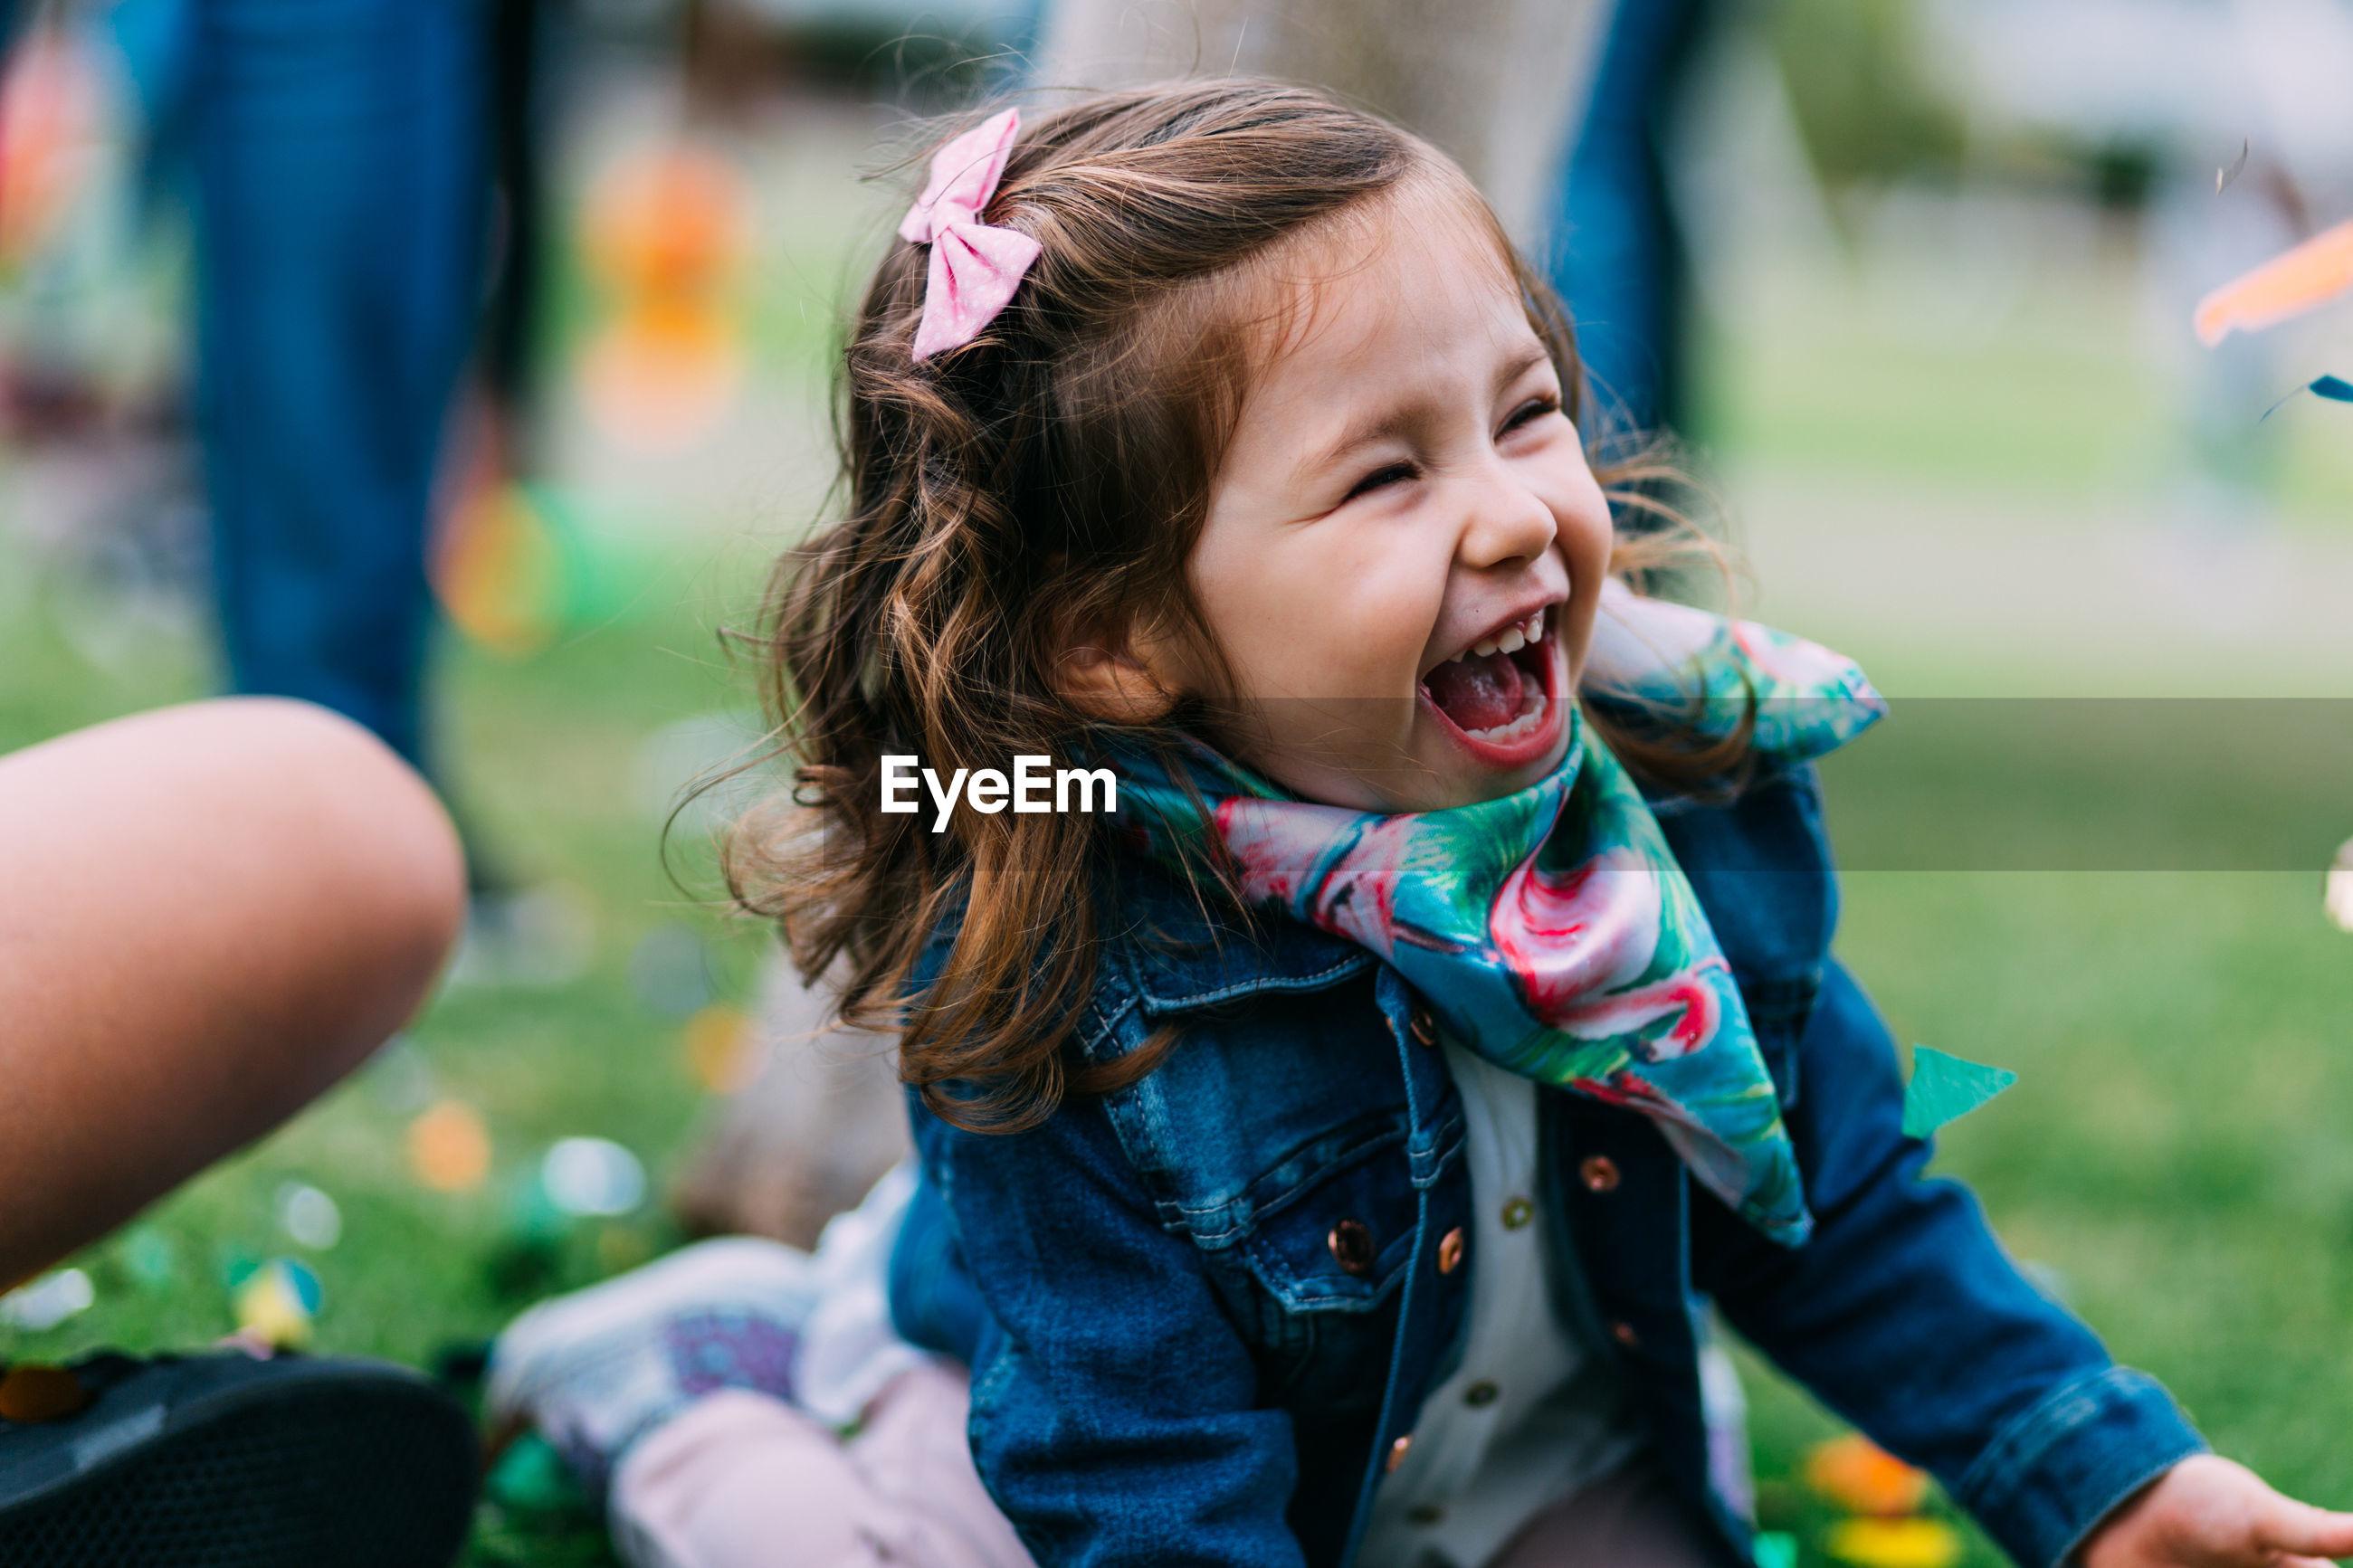 Cute cheerful girl sitting in park